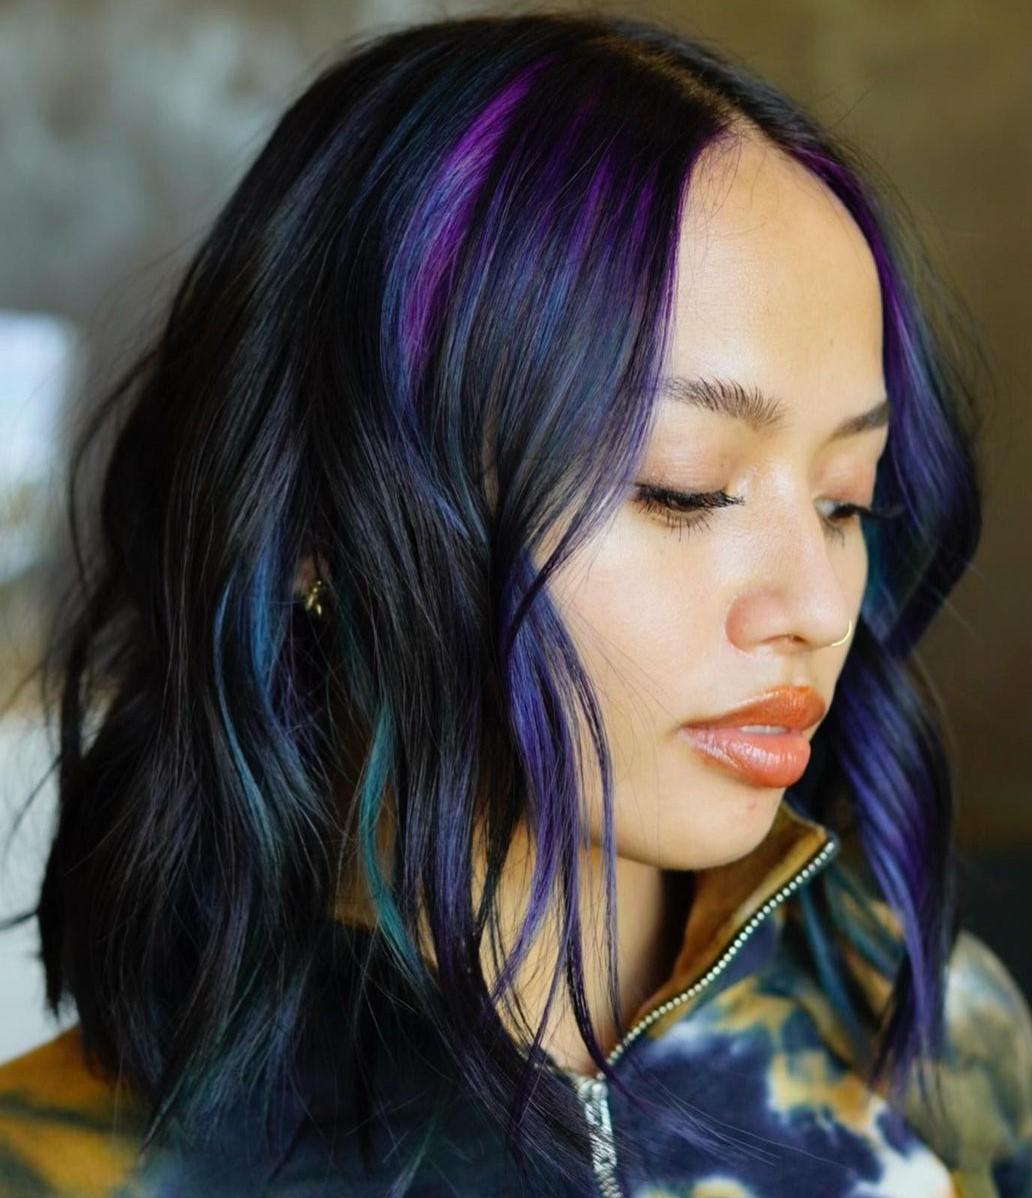 Dark Hair with Blue and Purple Peek-a-Boo Highlights